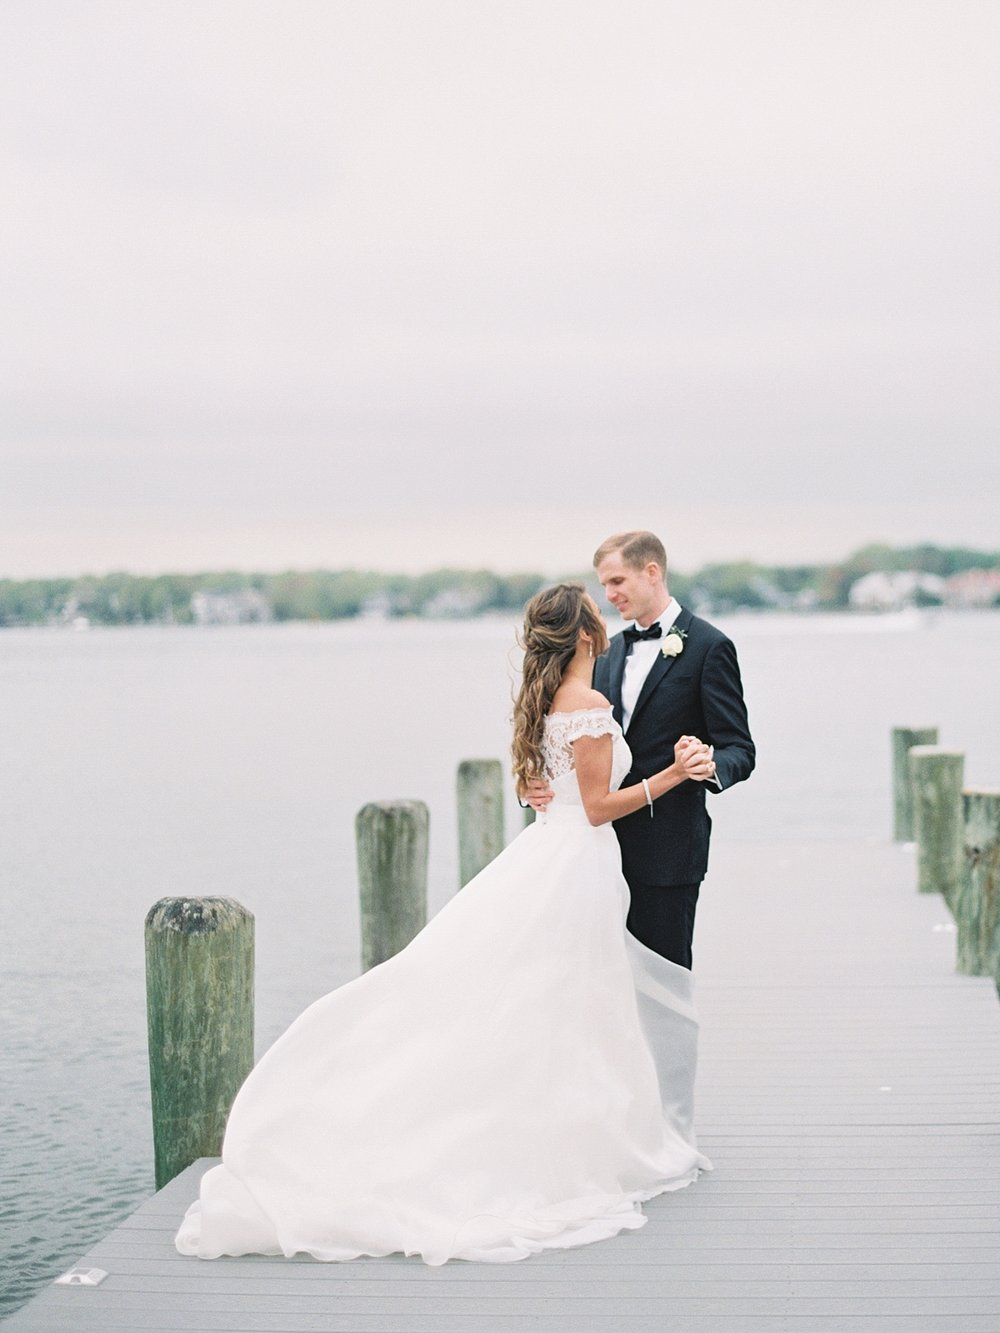 clarks_landing_nj_wedding_photography_0064.jpg